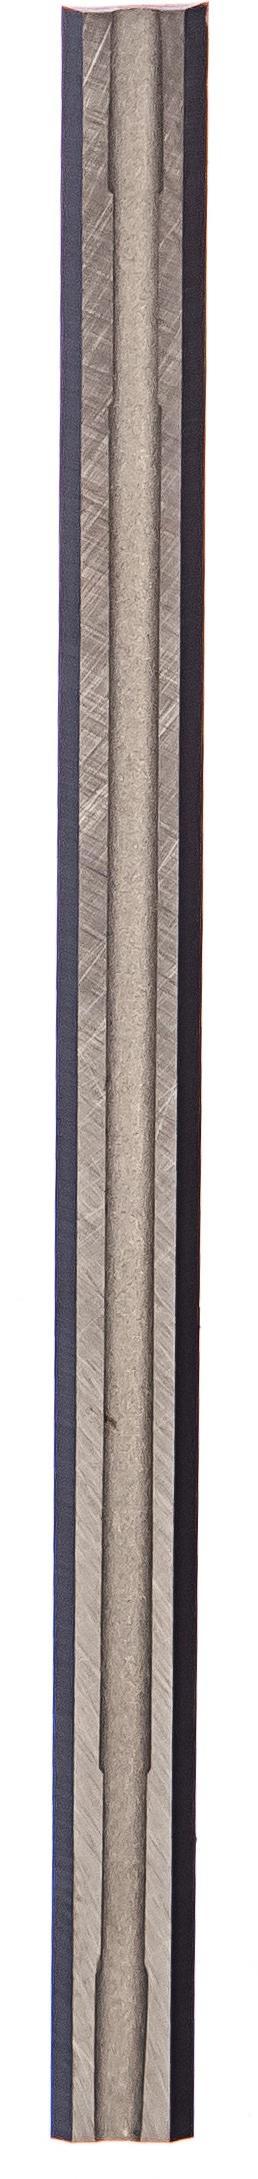 Ножи для рубанка Bosch 82мм (woodrazor 2.608.635.350, 2 шт.)